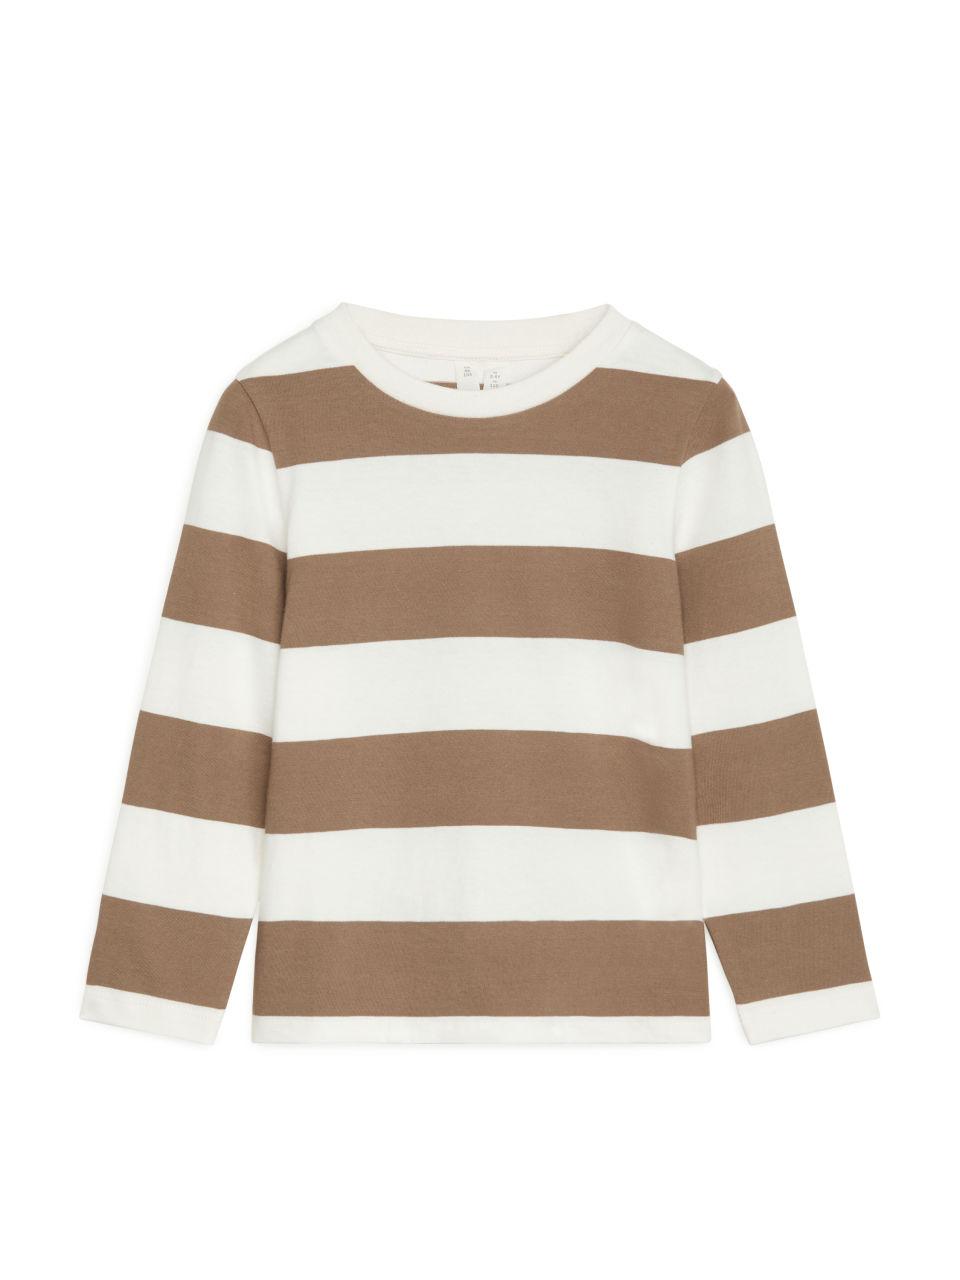 Block Stripe Top - White